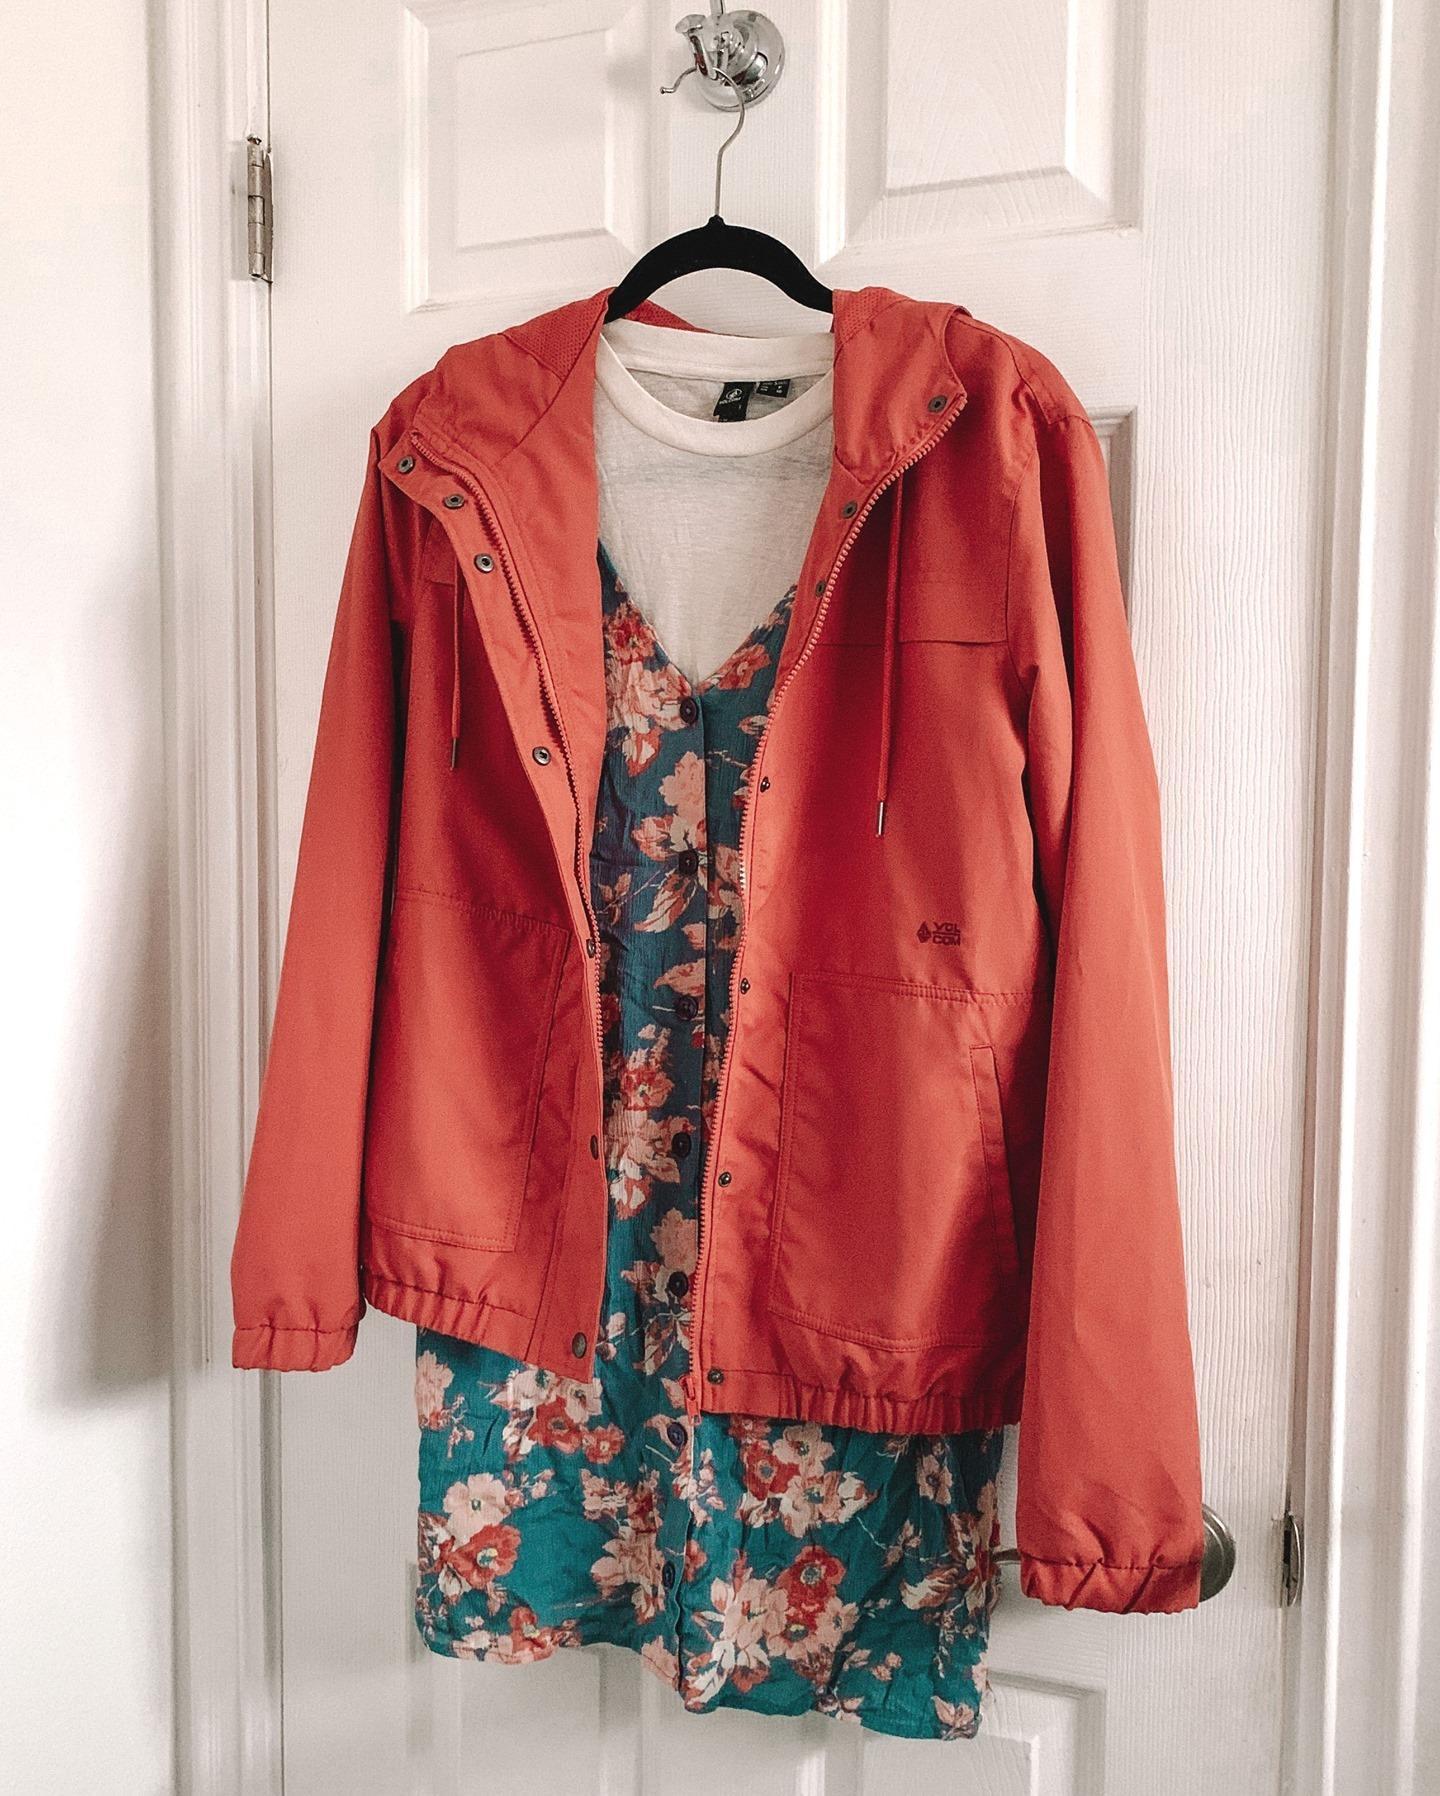 jacket top dress